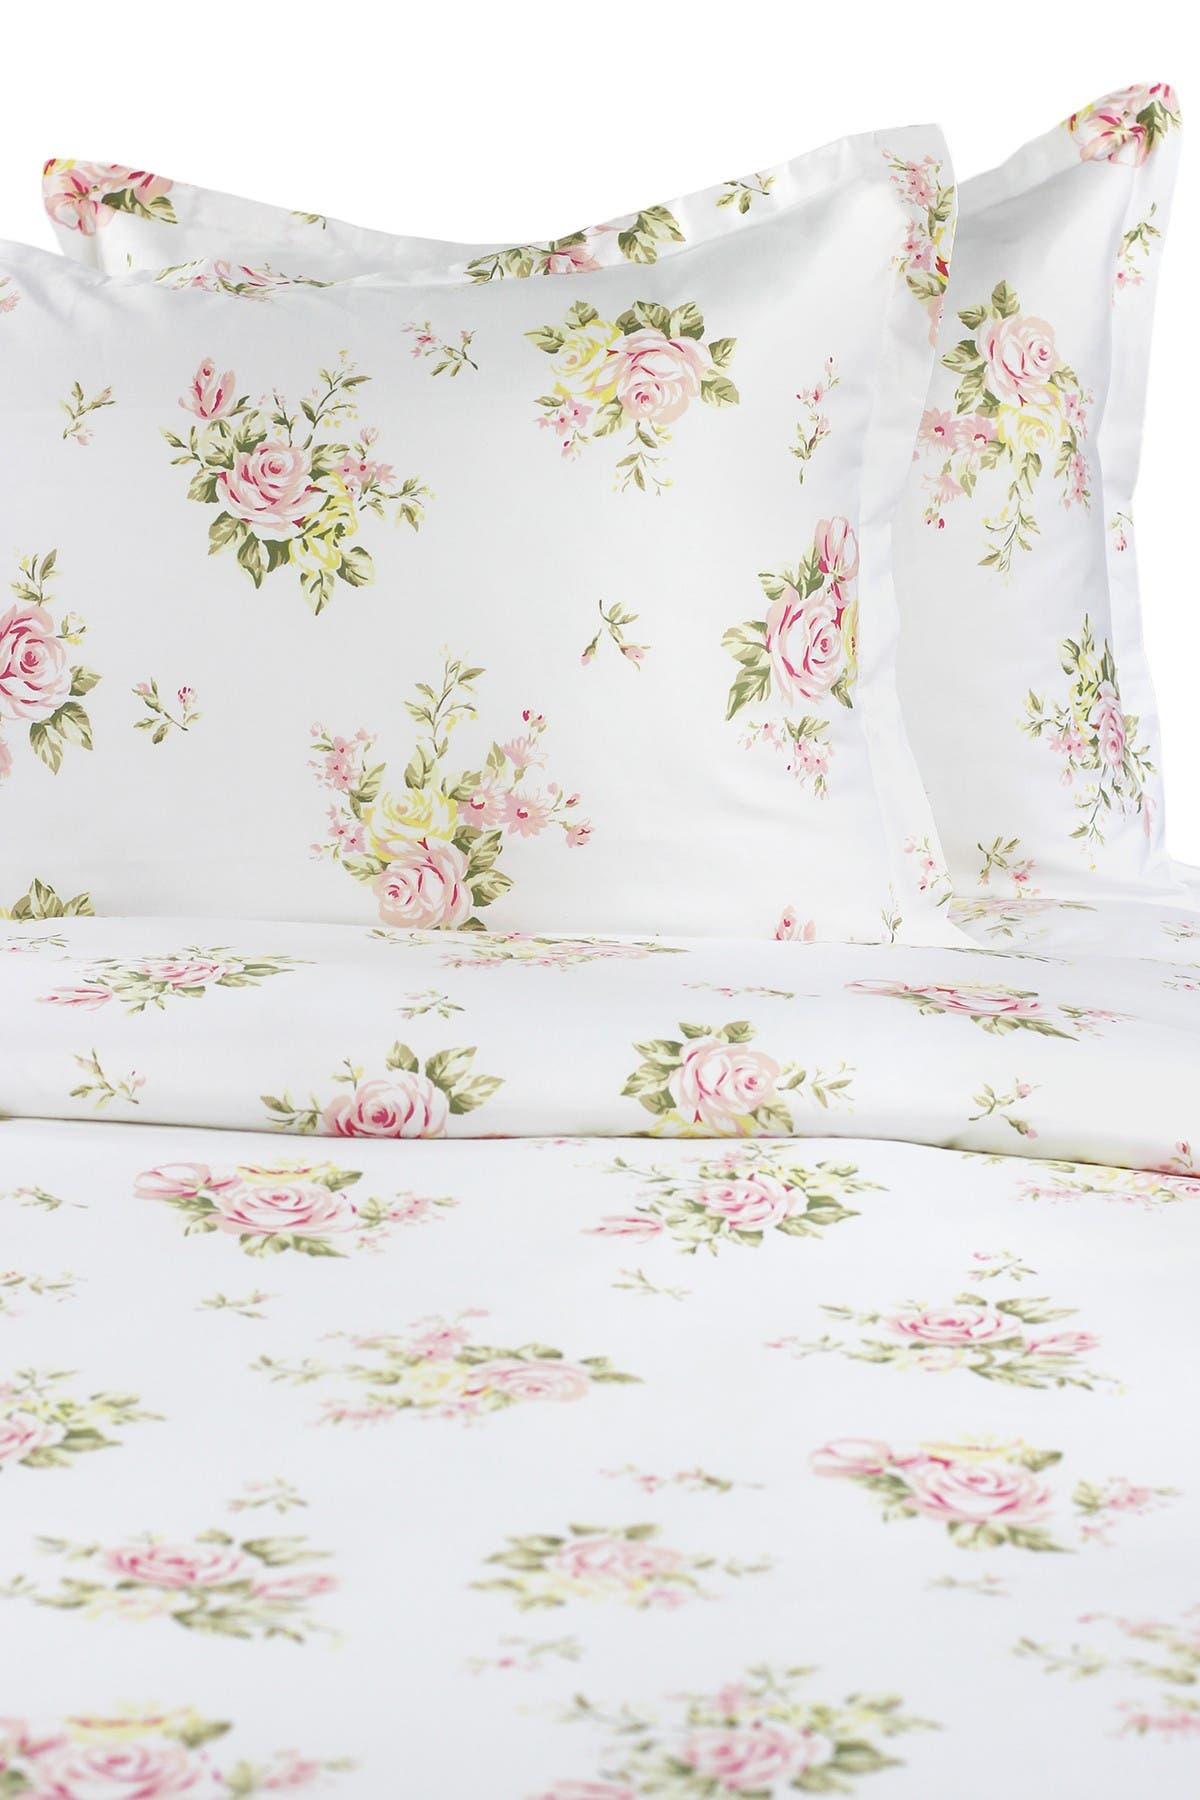 Image of Melange Home Full/Queen 400 Thread Count Cotton Rose Bouquet Duvet Set - White/Pink